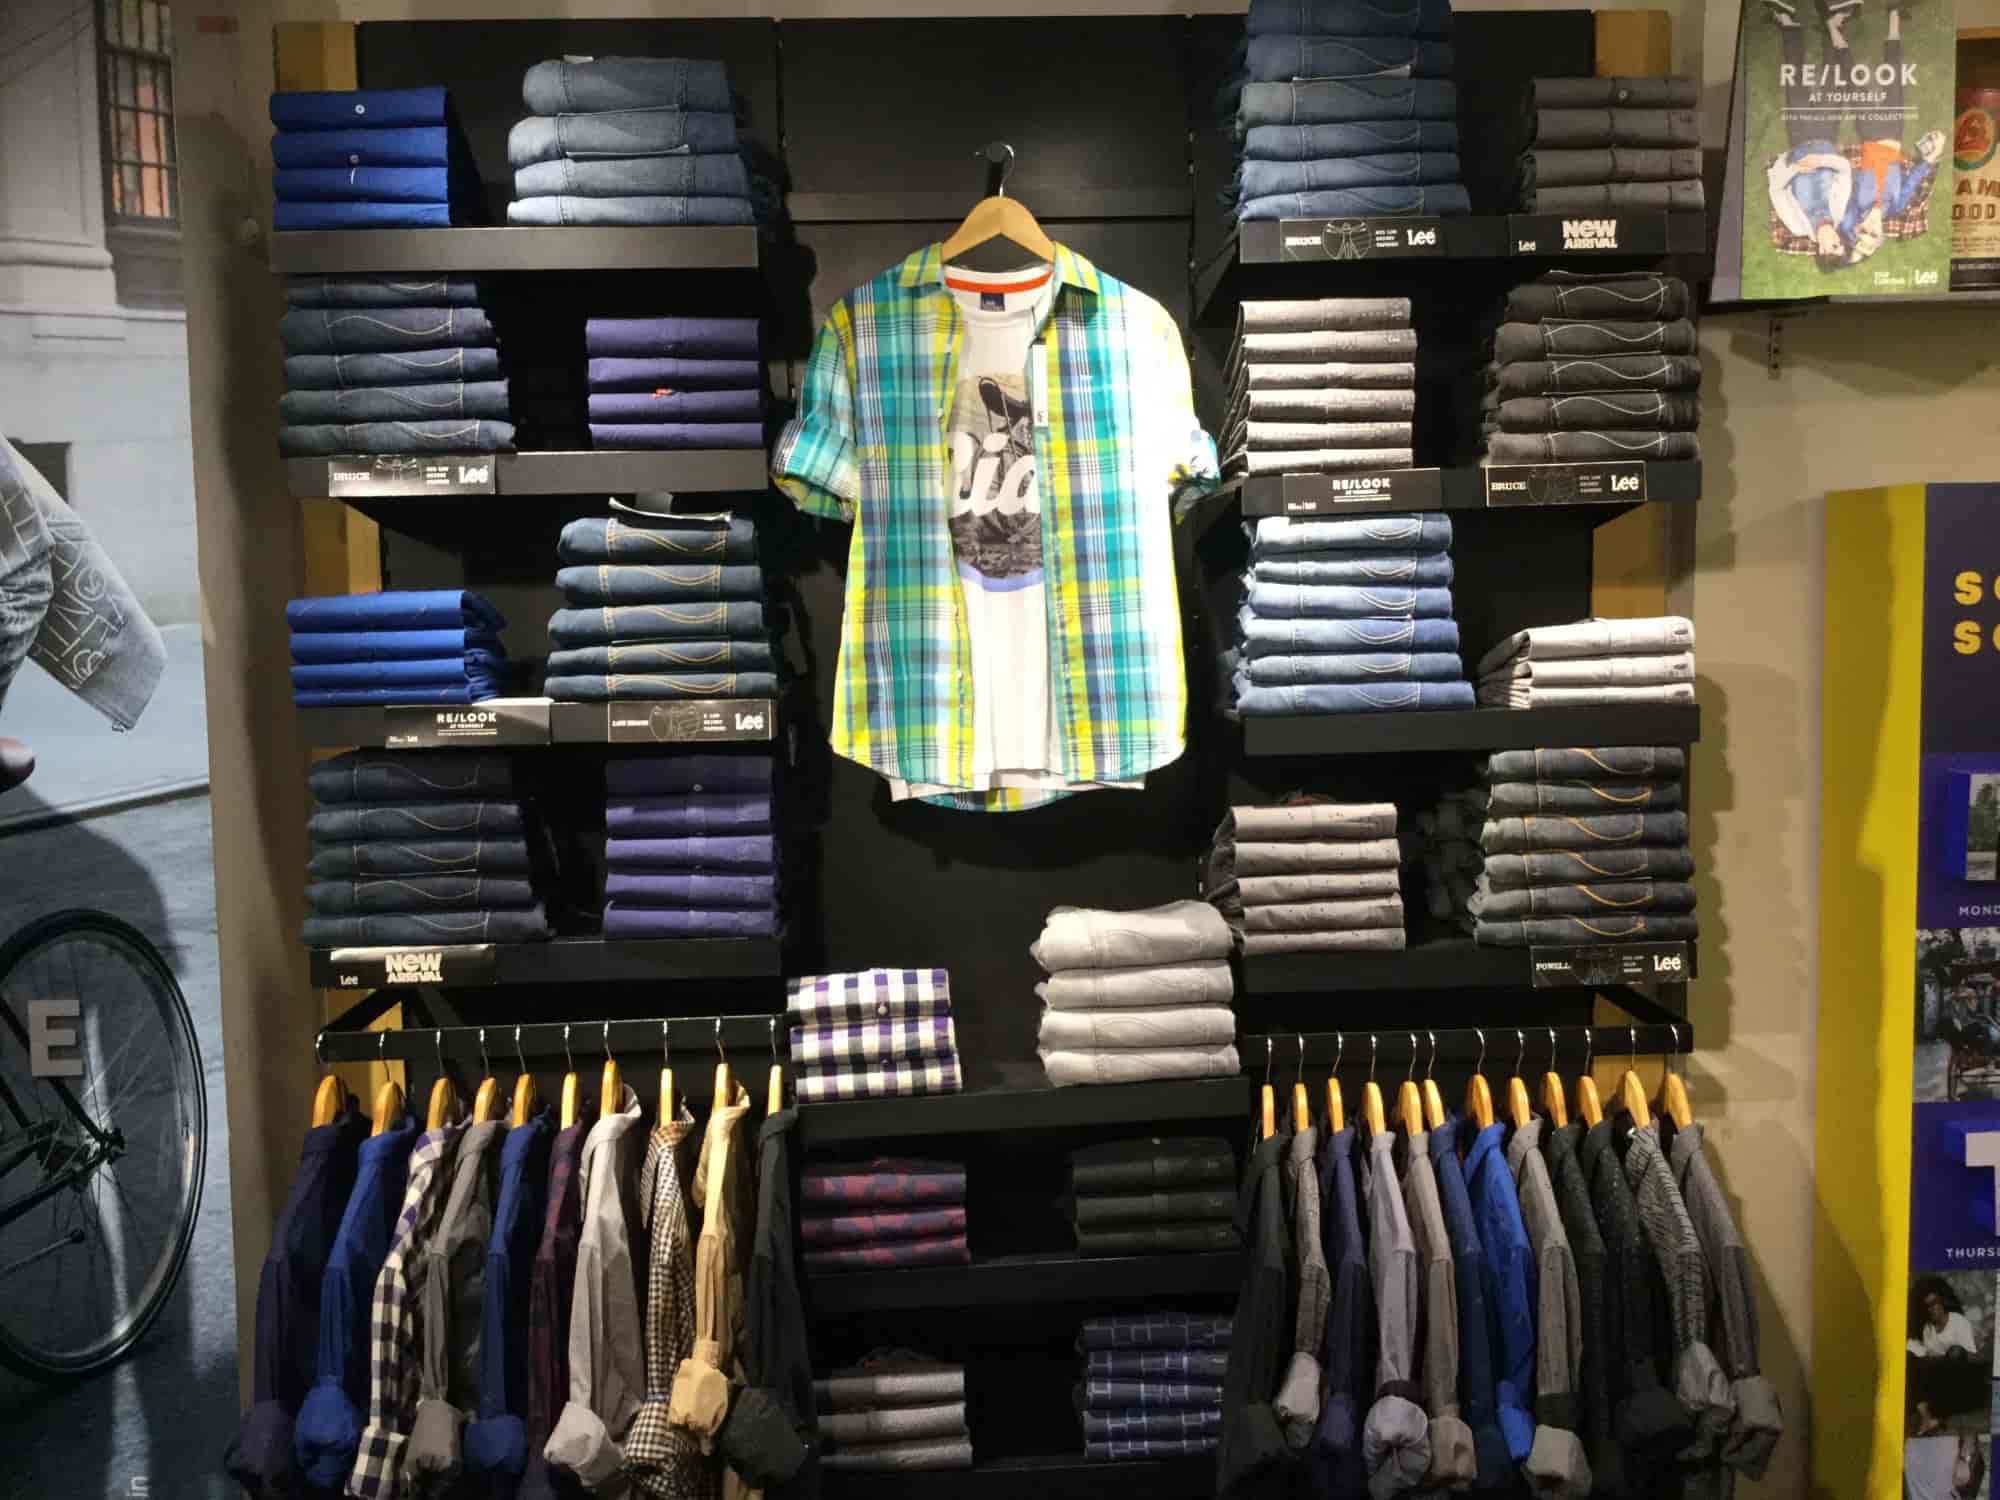 84ff6659 Lee Store, Mg Road - Readymade Garment Retailers in Gurgaon, Delhi -  Justdial